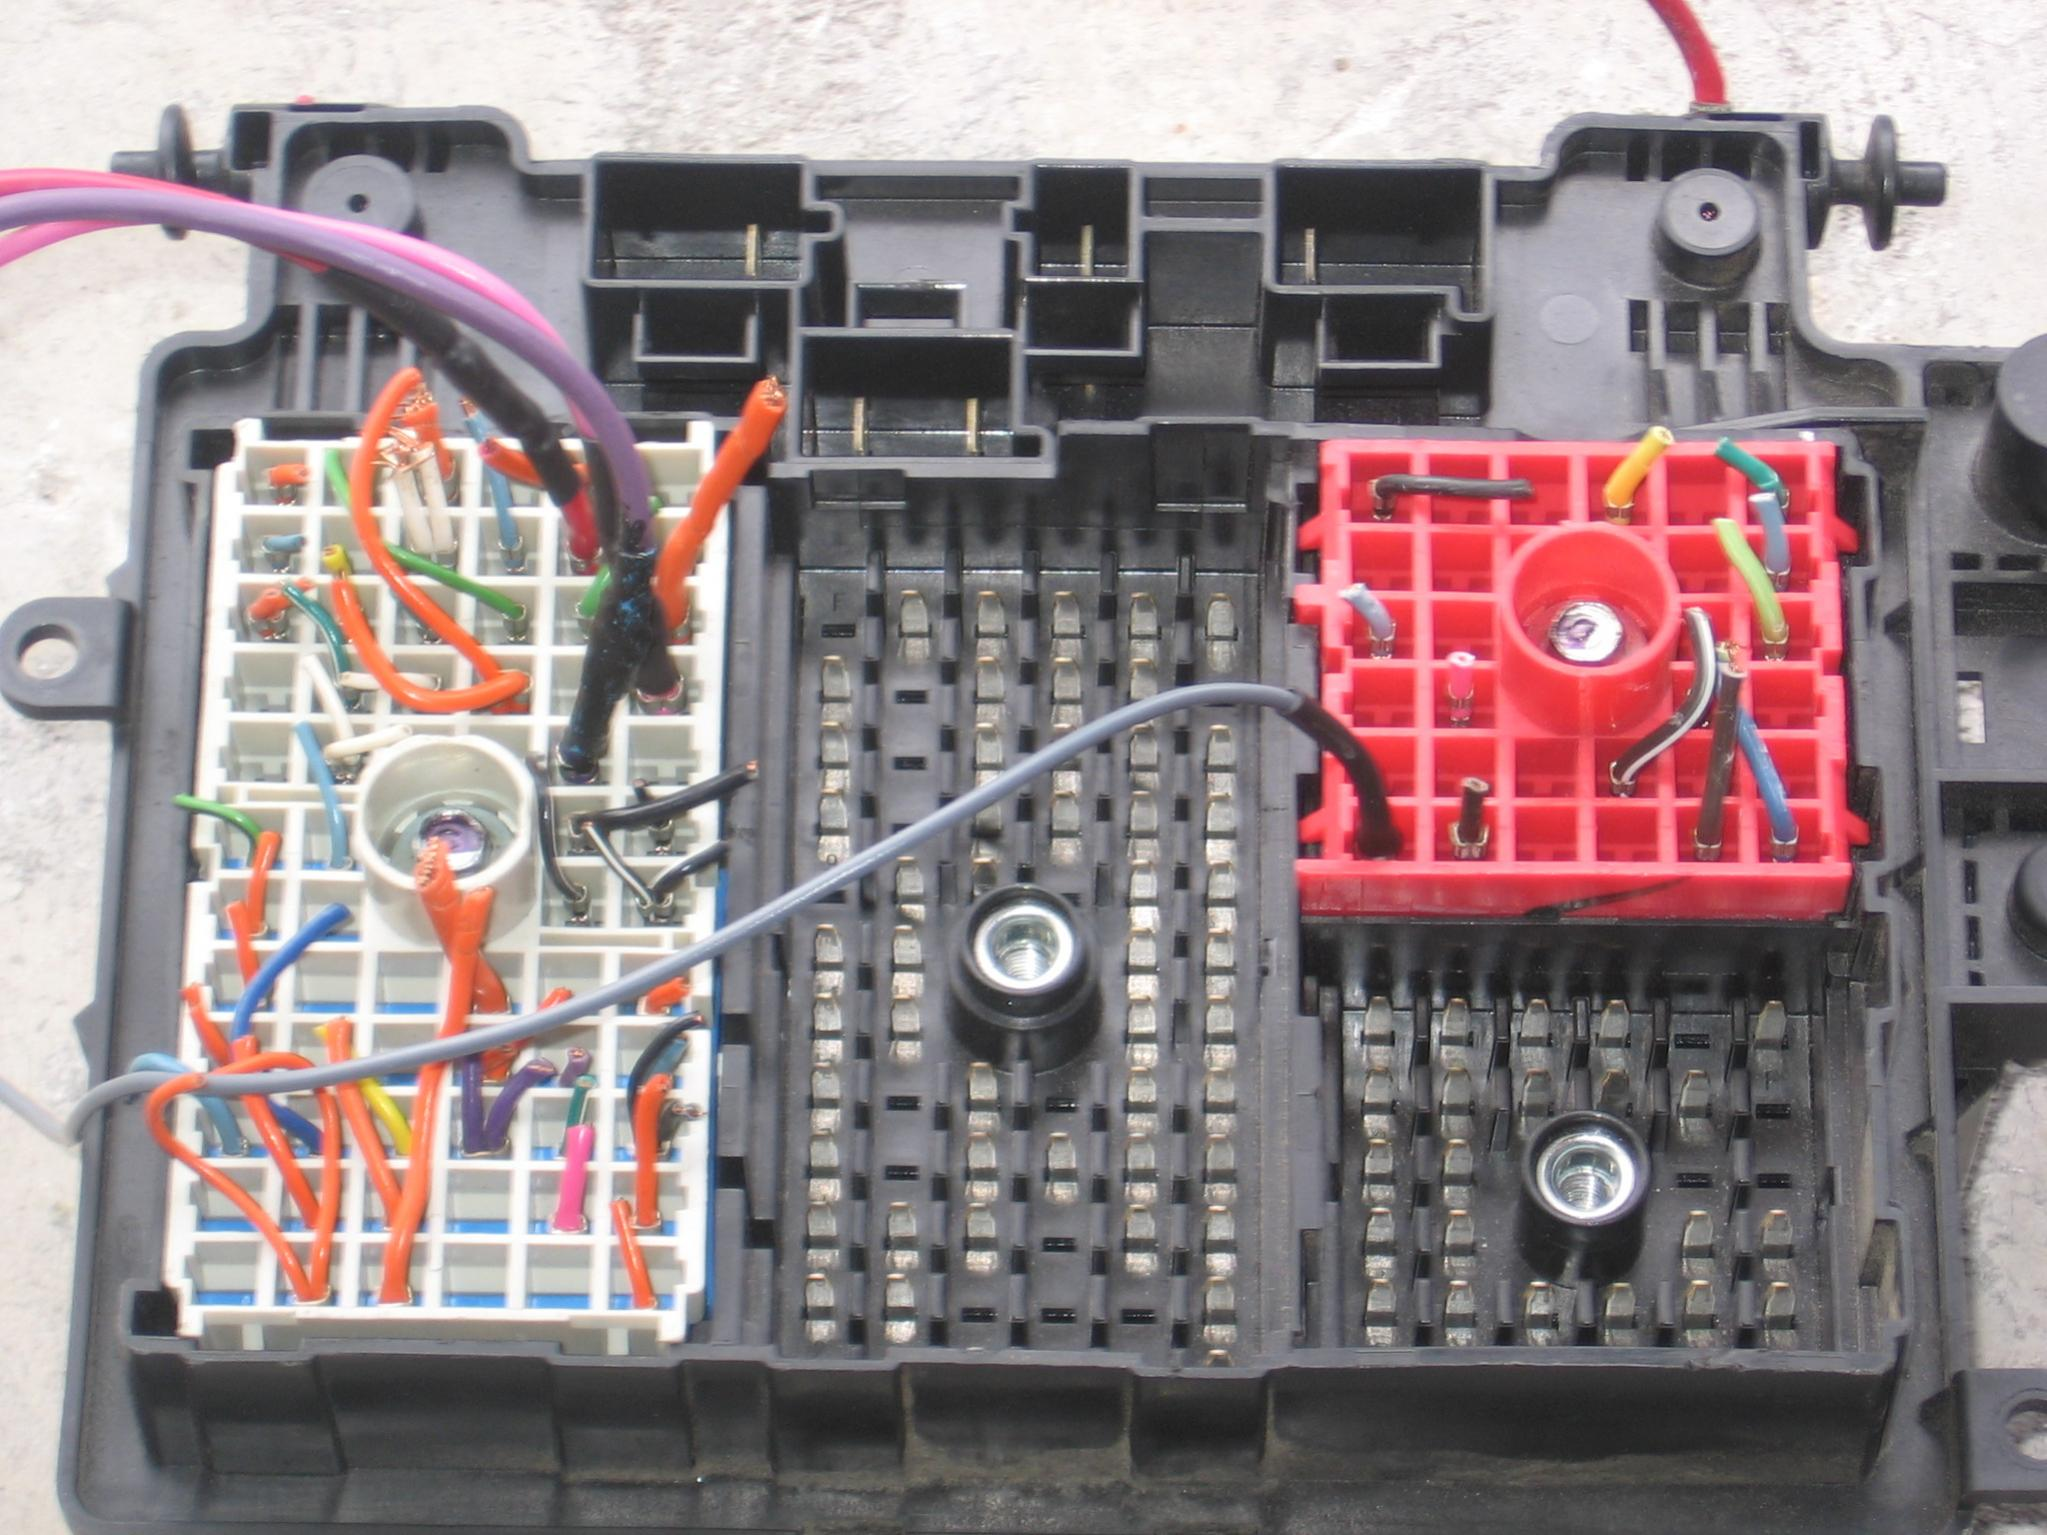 5 7 vortec wiring harness diagram engine 5.3 basics - page ls1tech